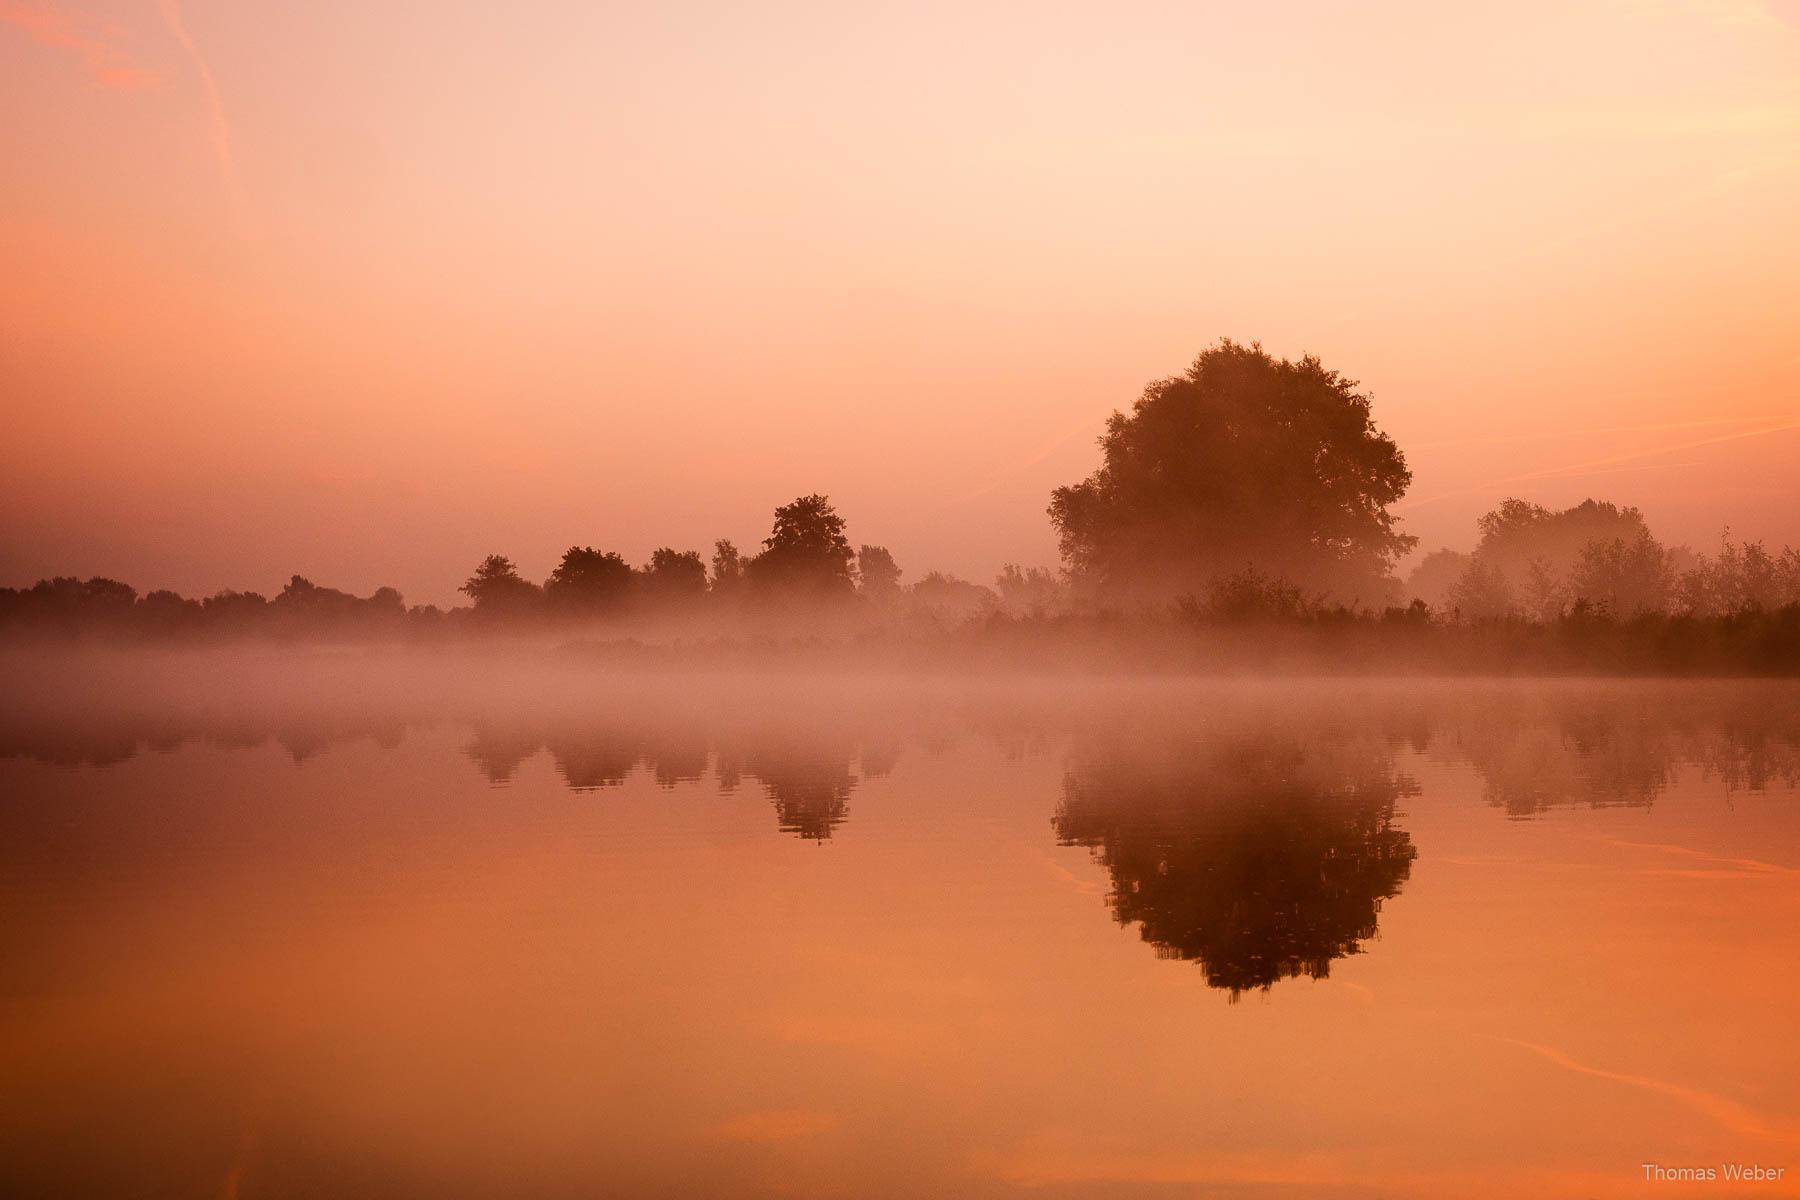 Sonnenaufgang an der Hunte